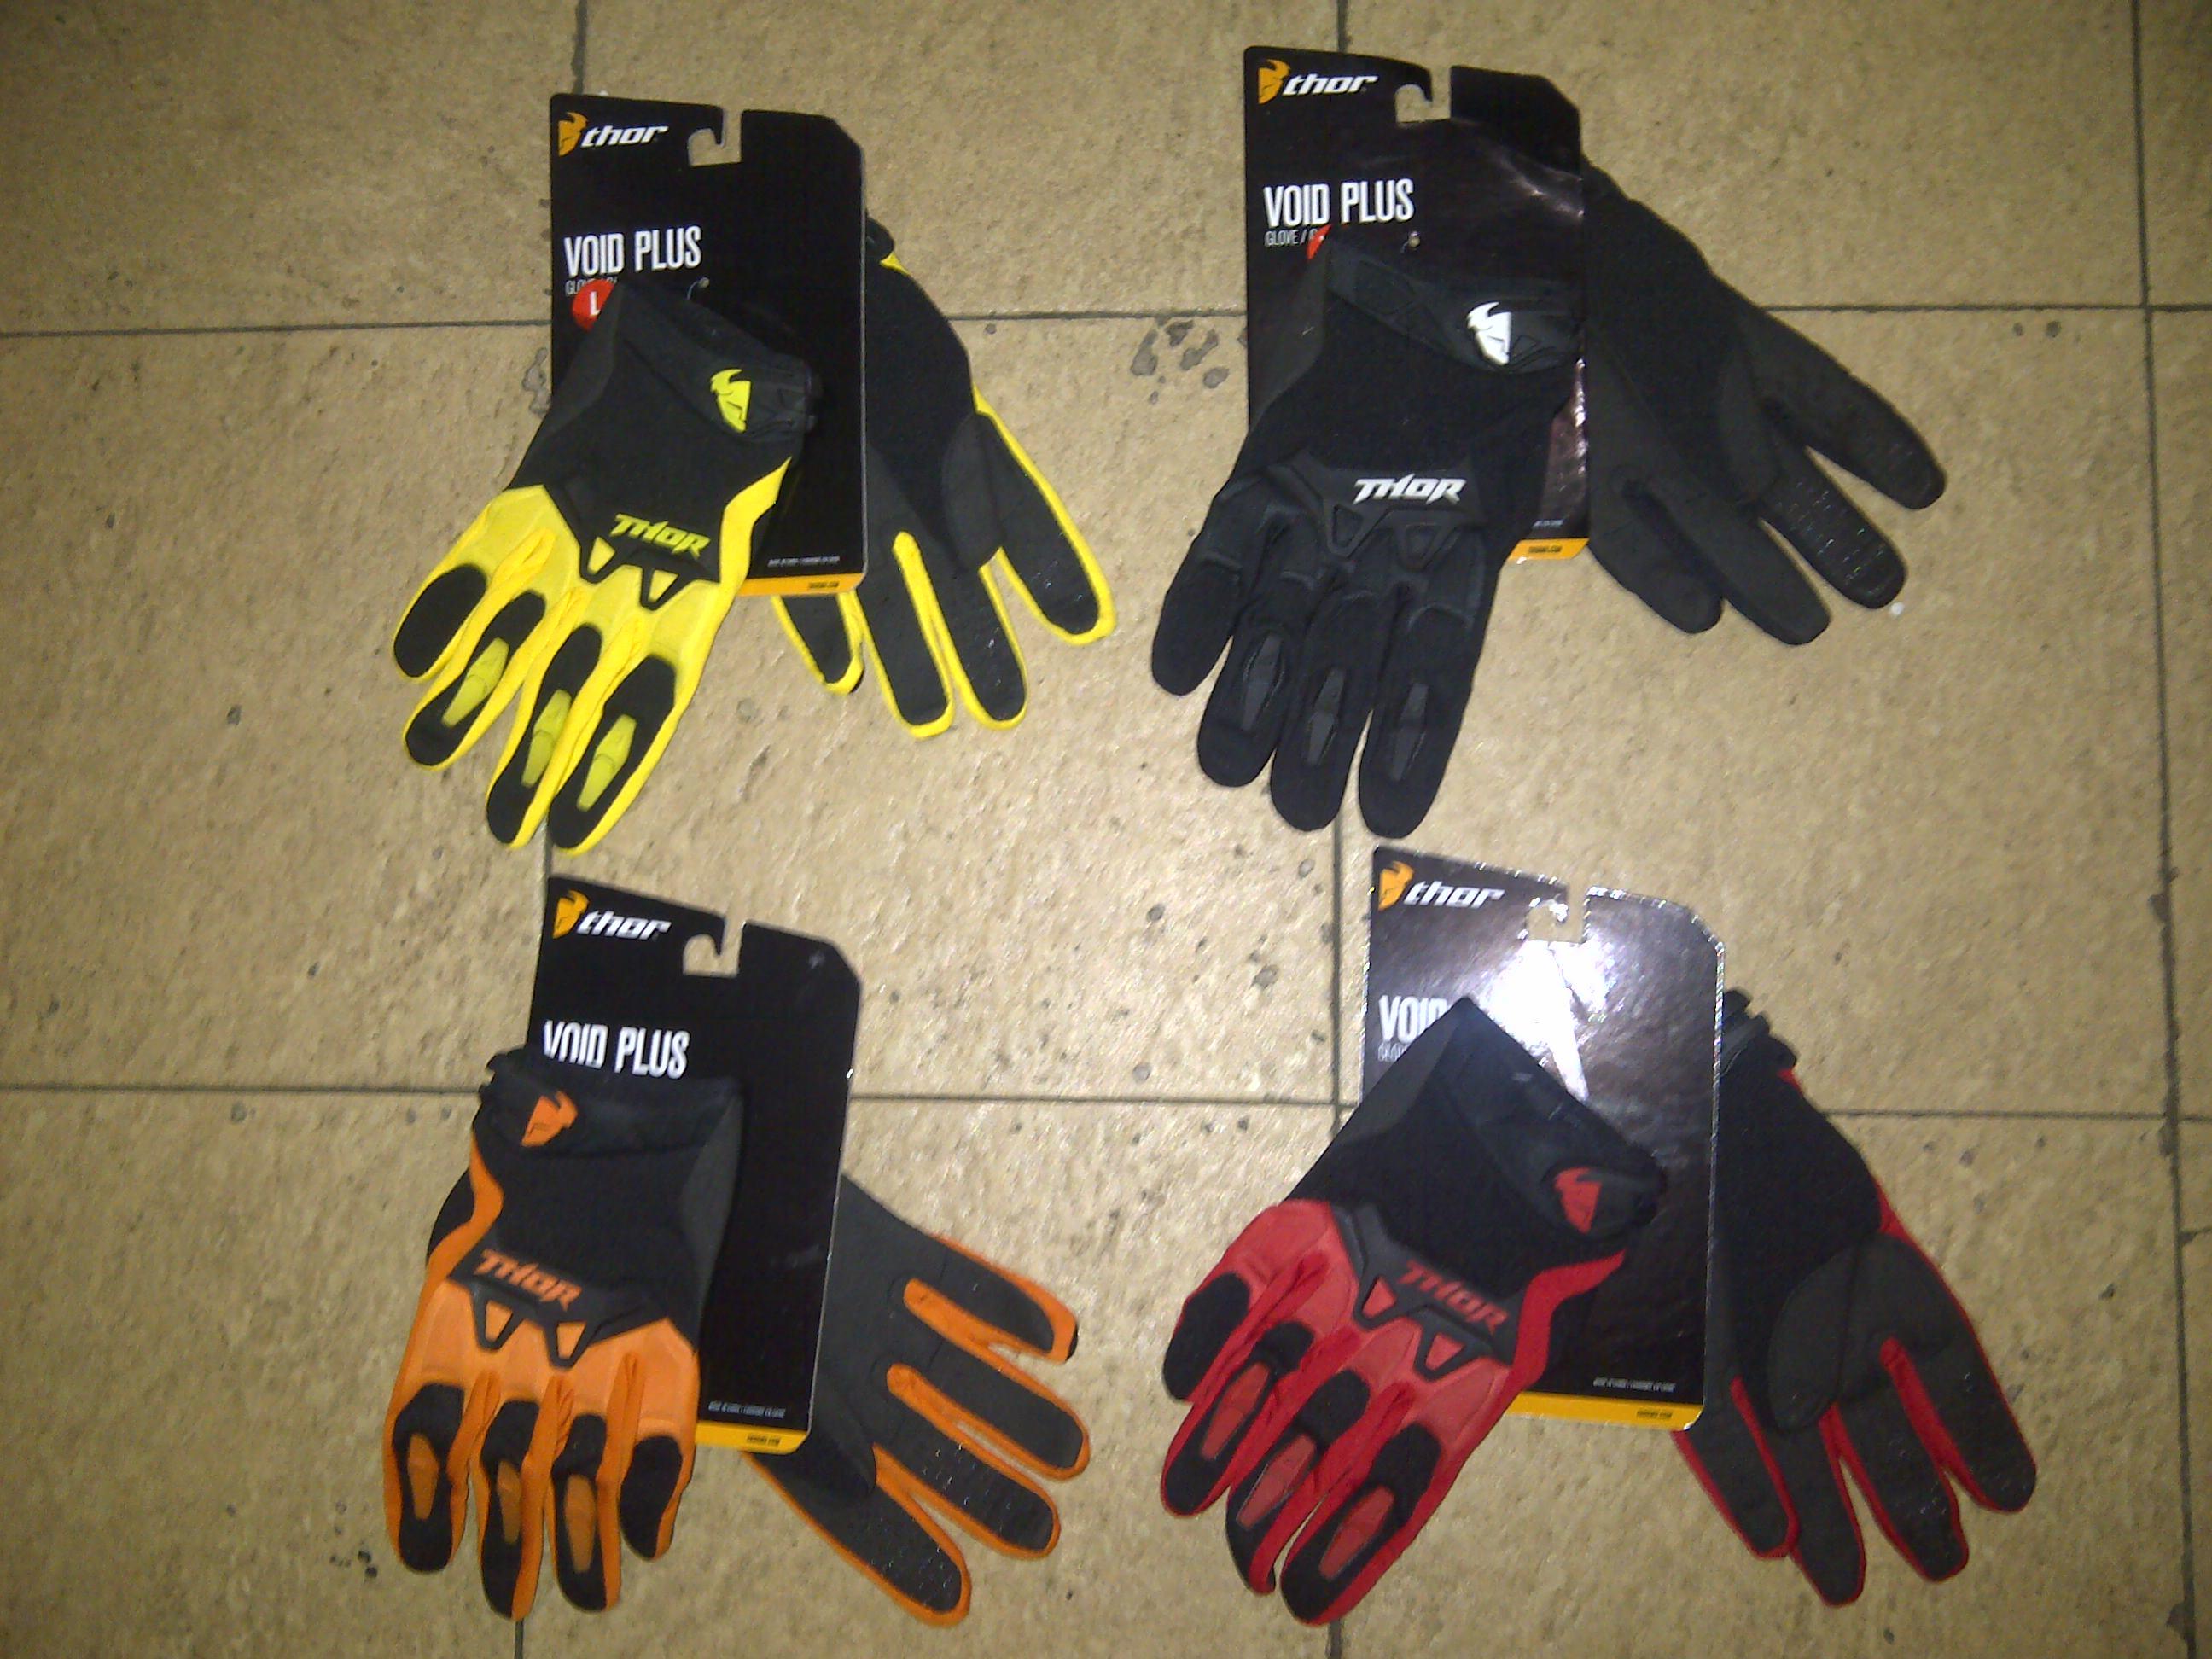 IMG 20150326 00675 glove thor void plus original  Rp.185.000 uk.xl.L